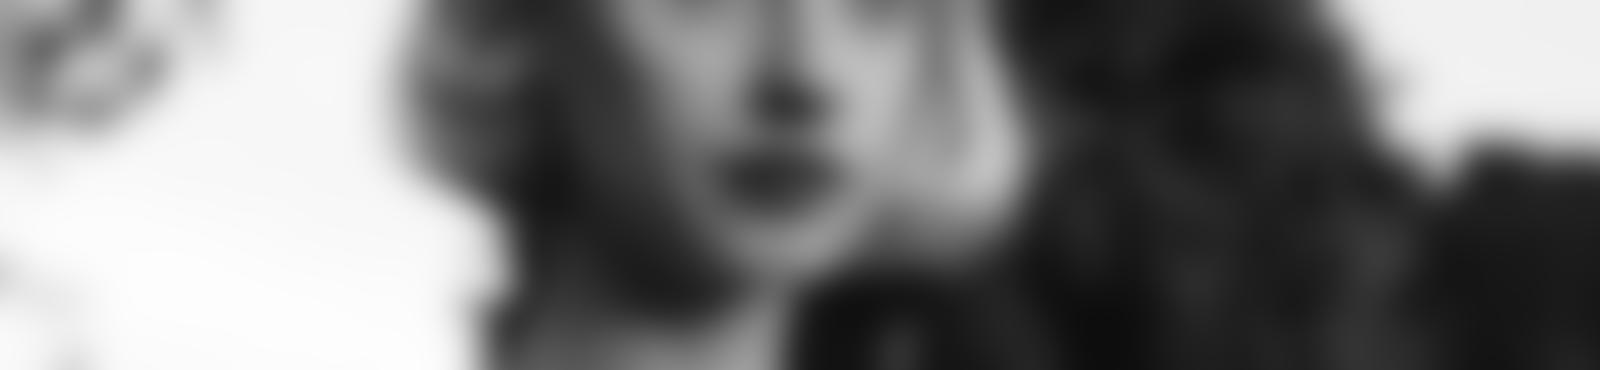 Blurred 2b5cf011 5d7f 45ad 98ff 6bc70cd087ad